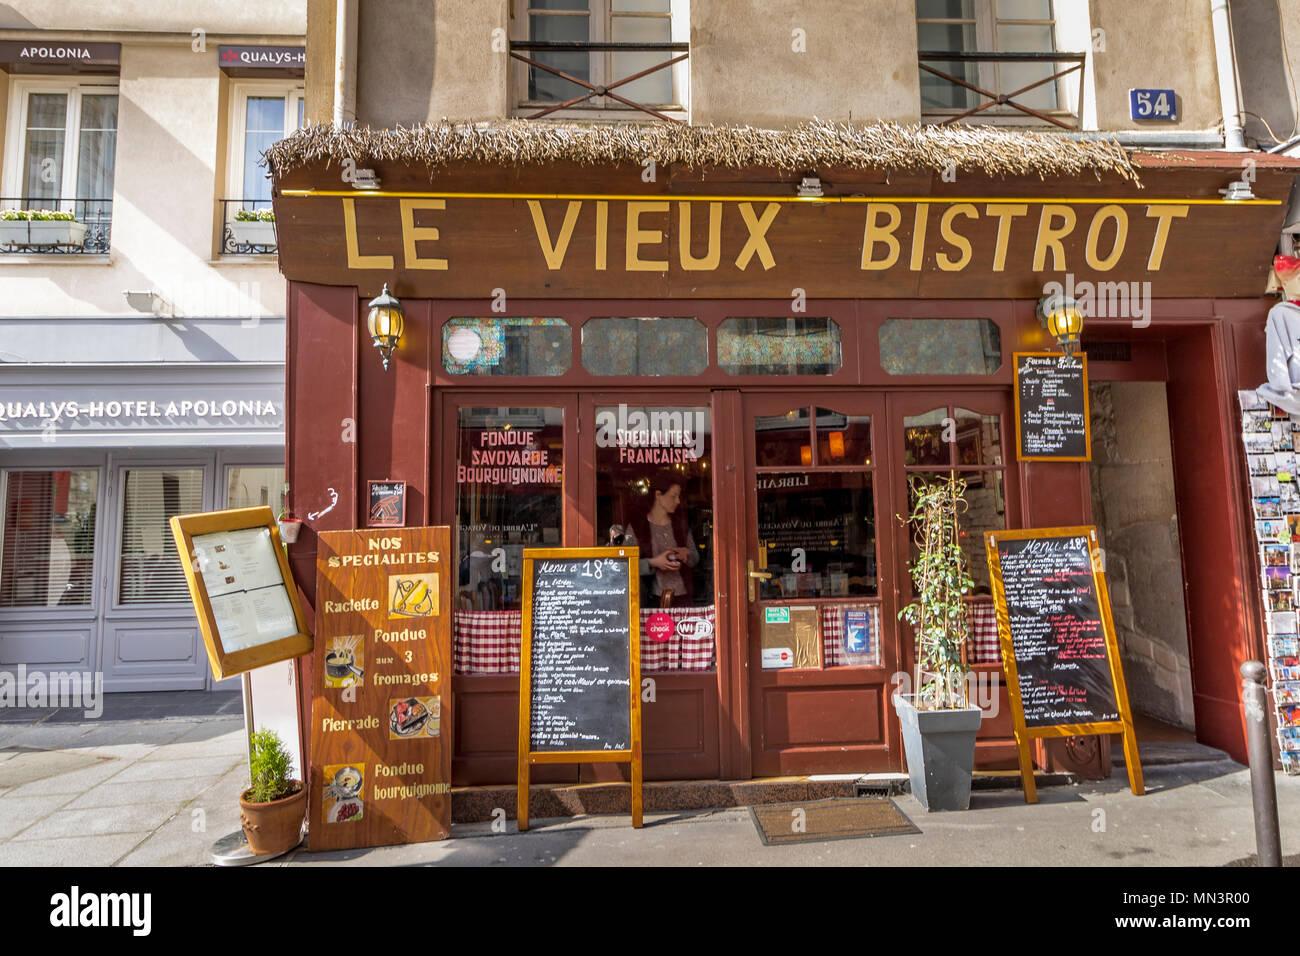 Menu blackboards outside Le Vieux Bistrot ,Rue Mouffetard, Paris, France - Stock Image